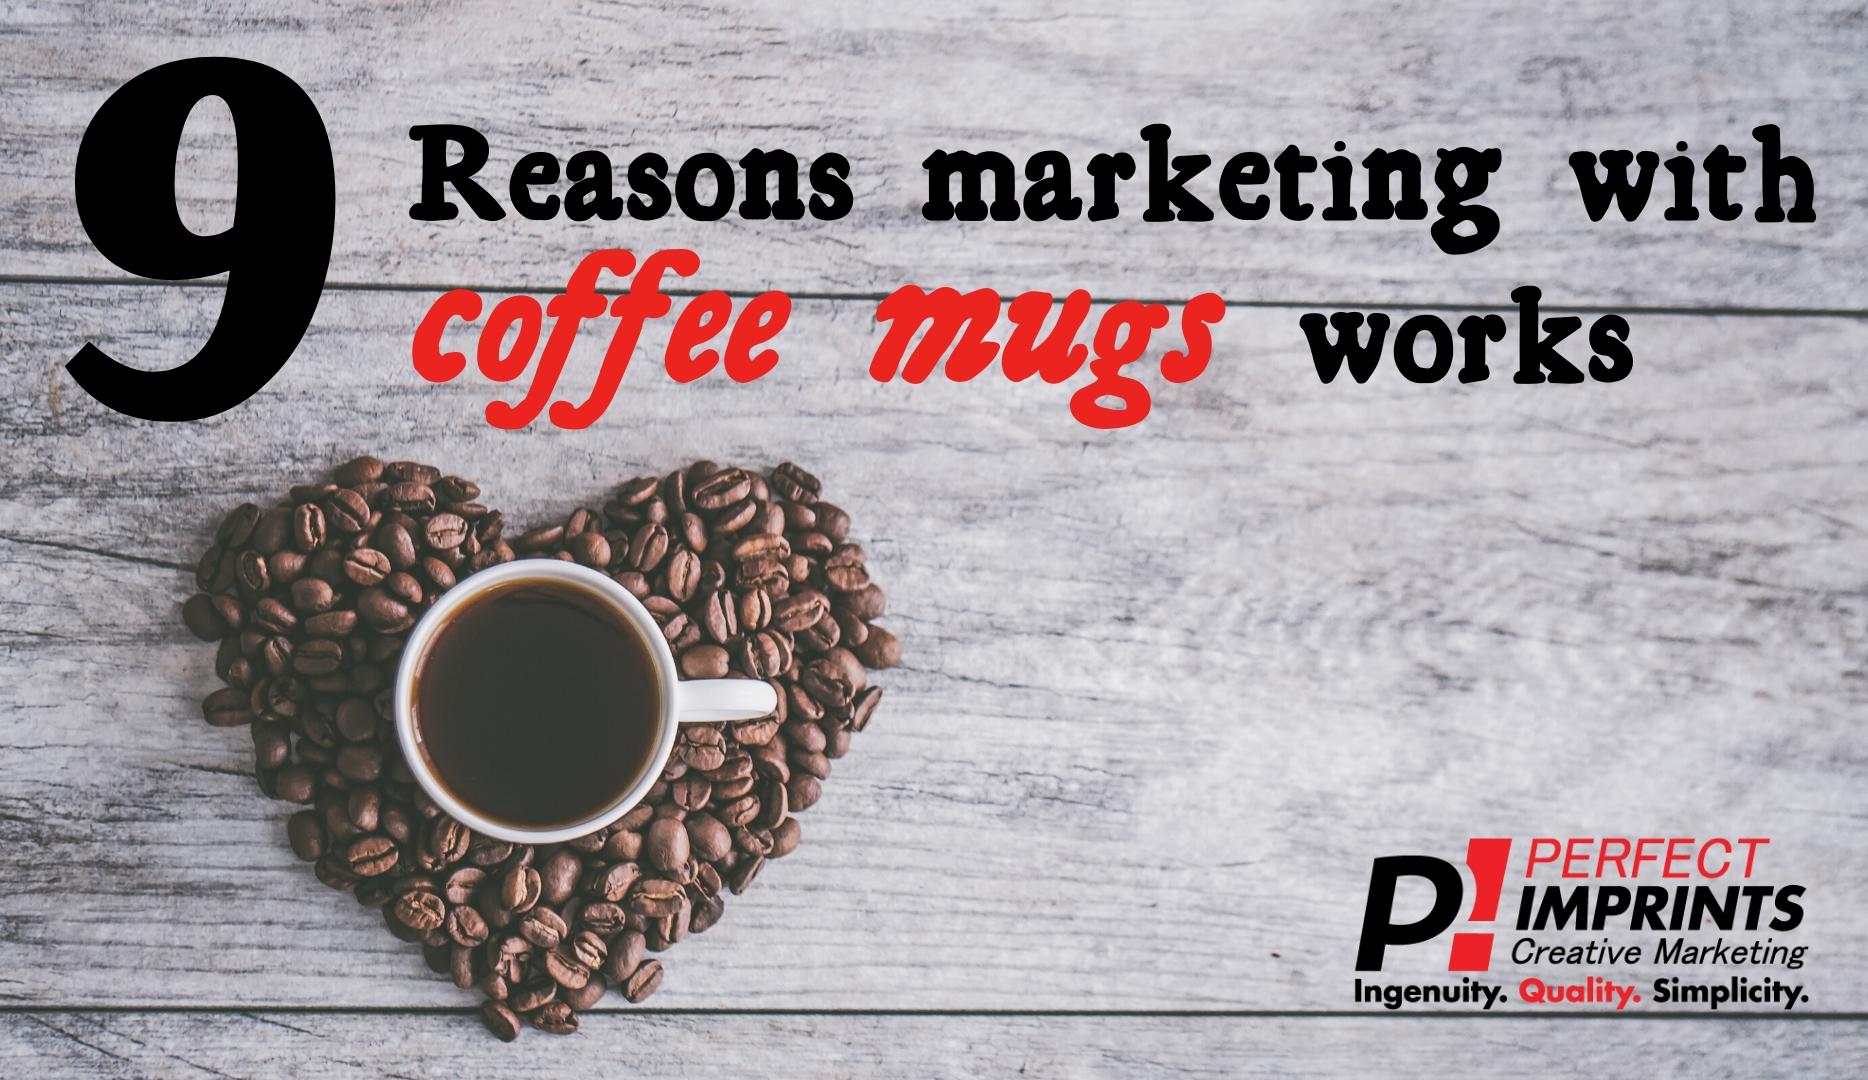 9 Reasons Marketing with Coffee Mugs Work